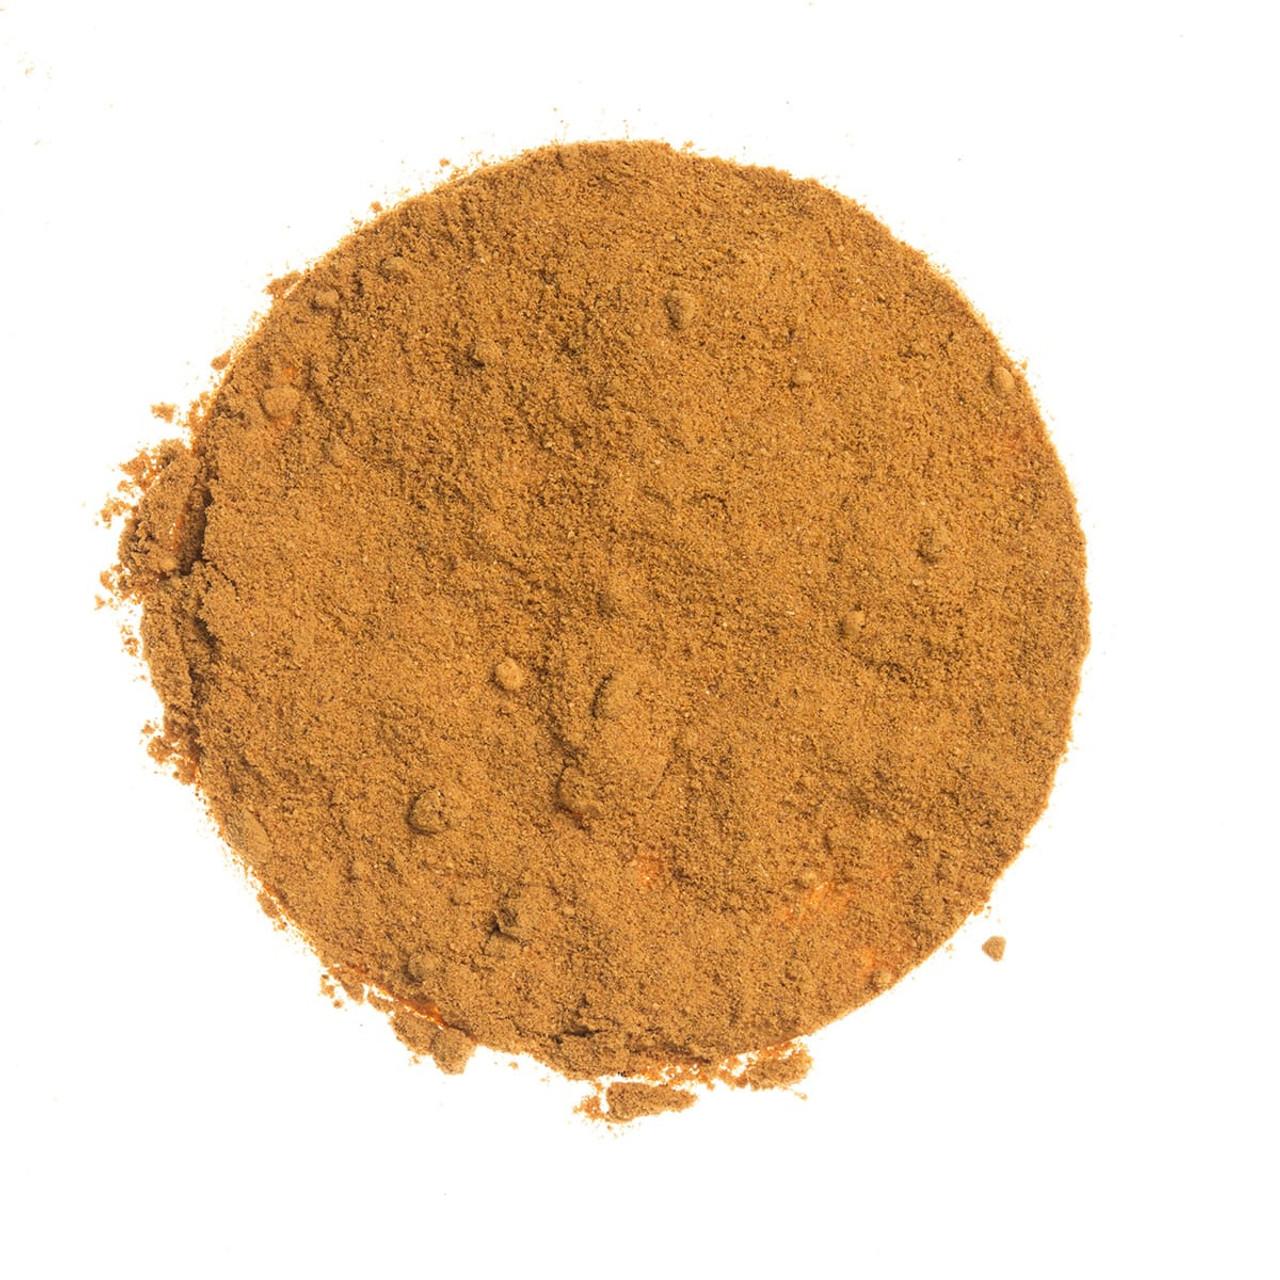 Bulk Habanero Powder | Ground Chile Peppers